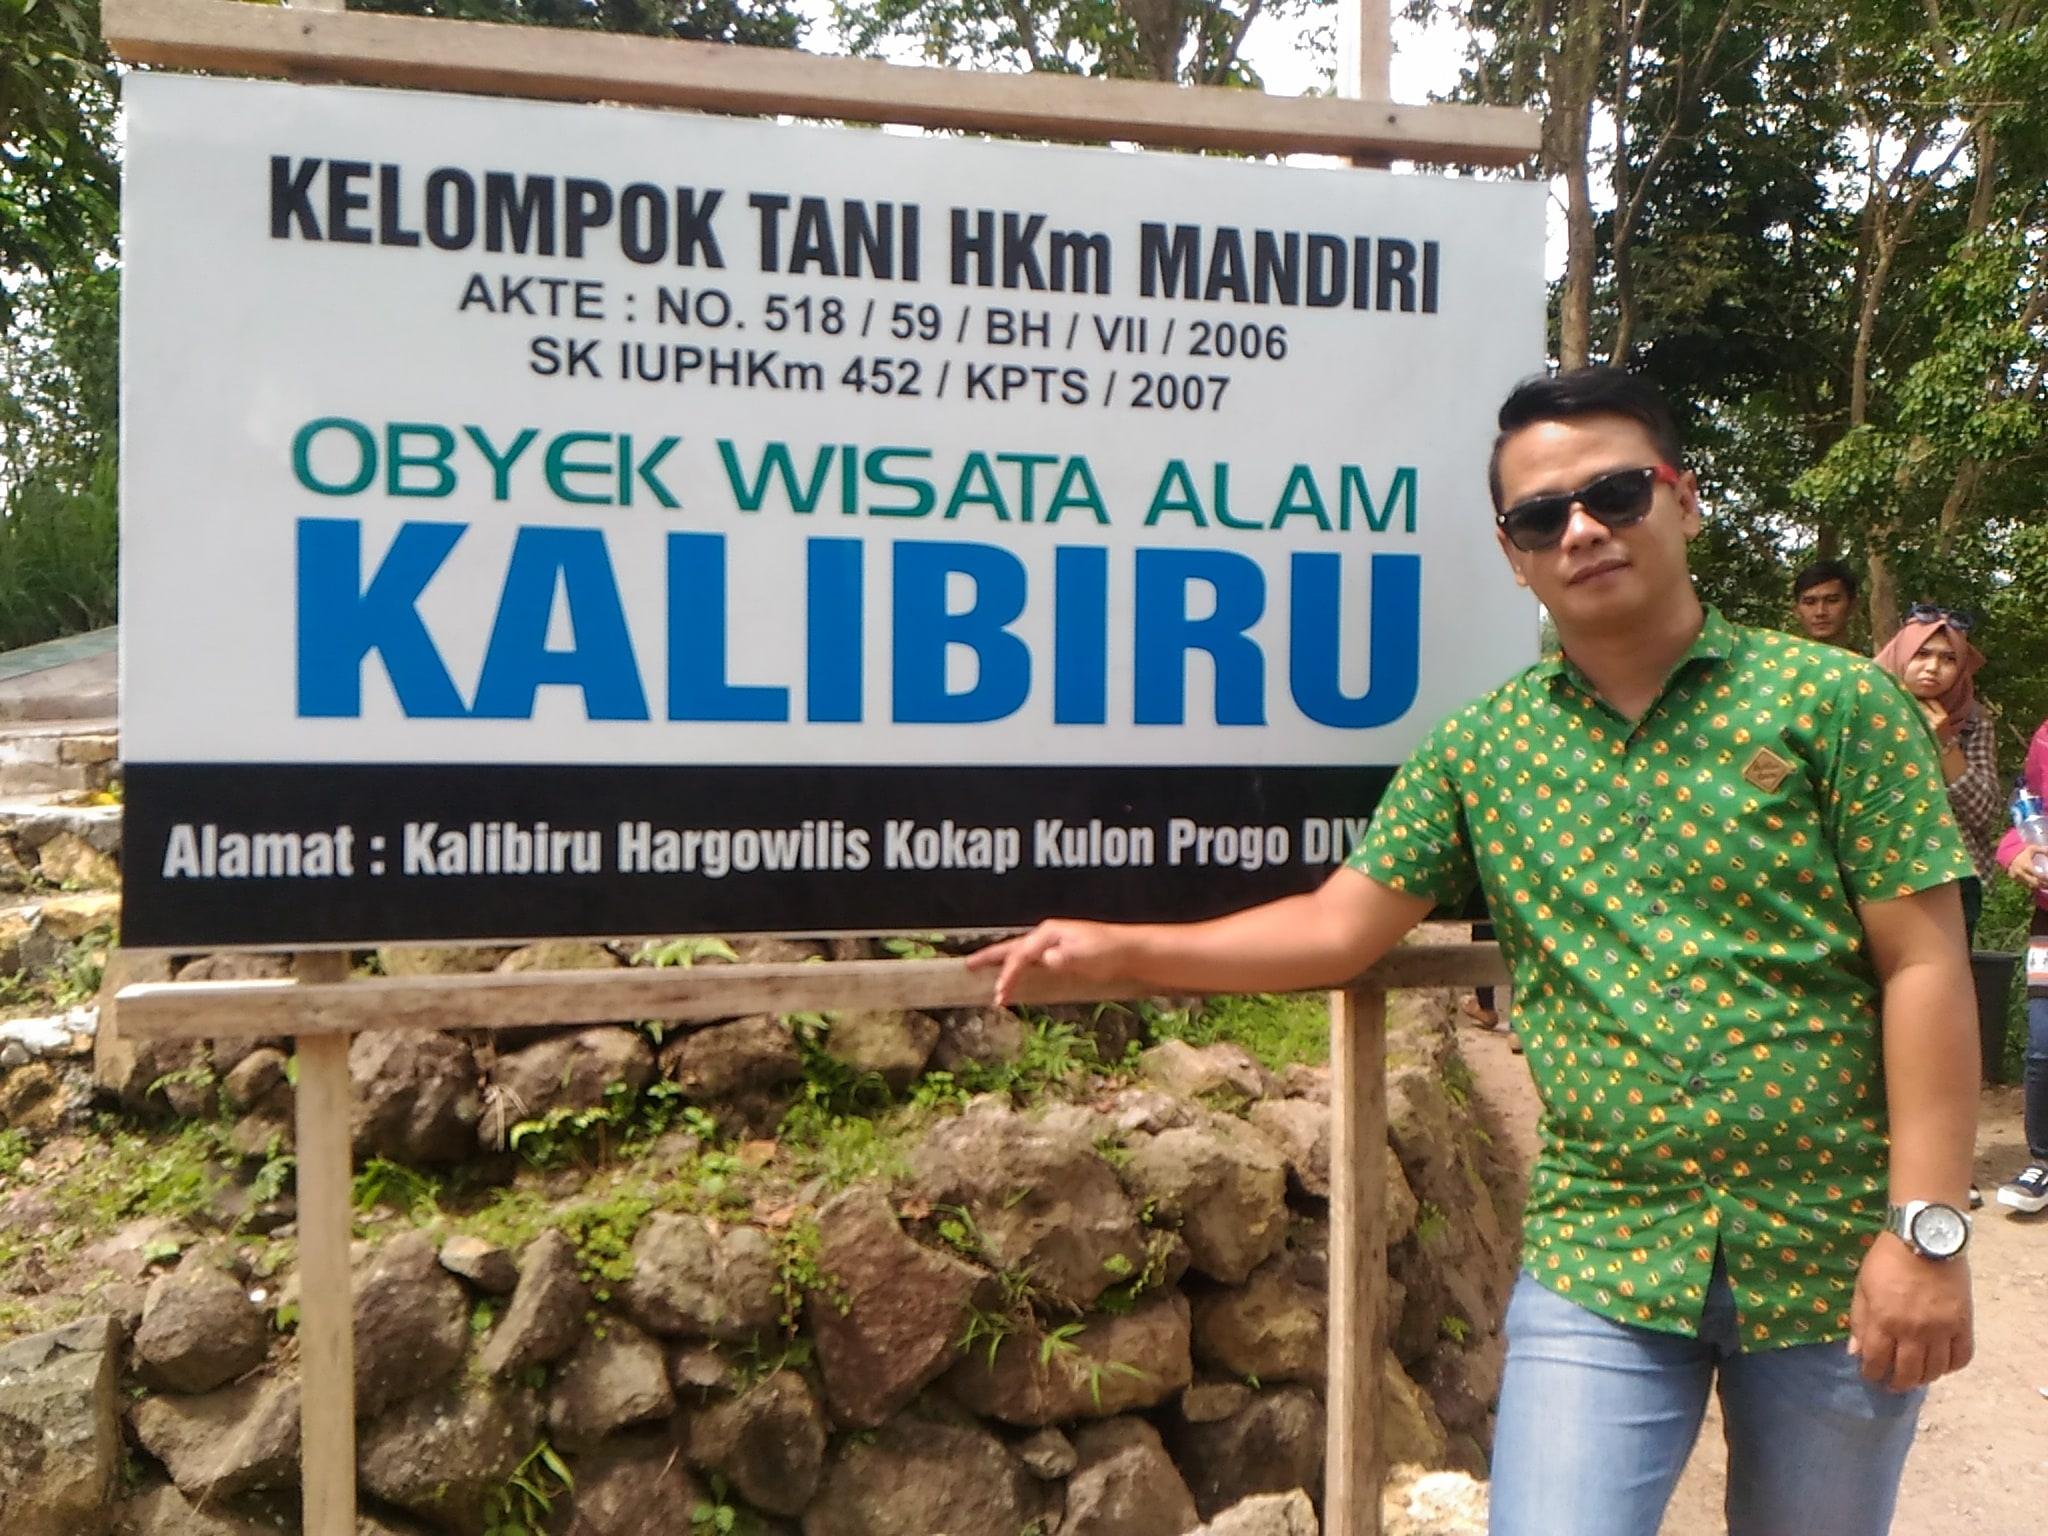 Kalibiru National Park of Yogyakarta